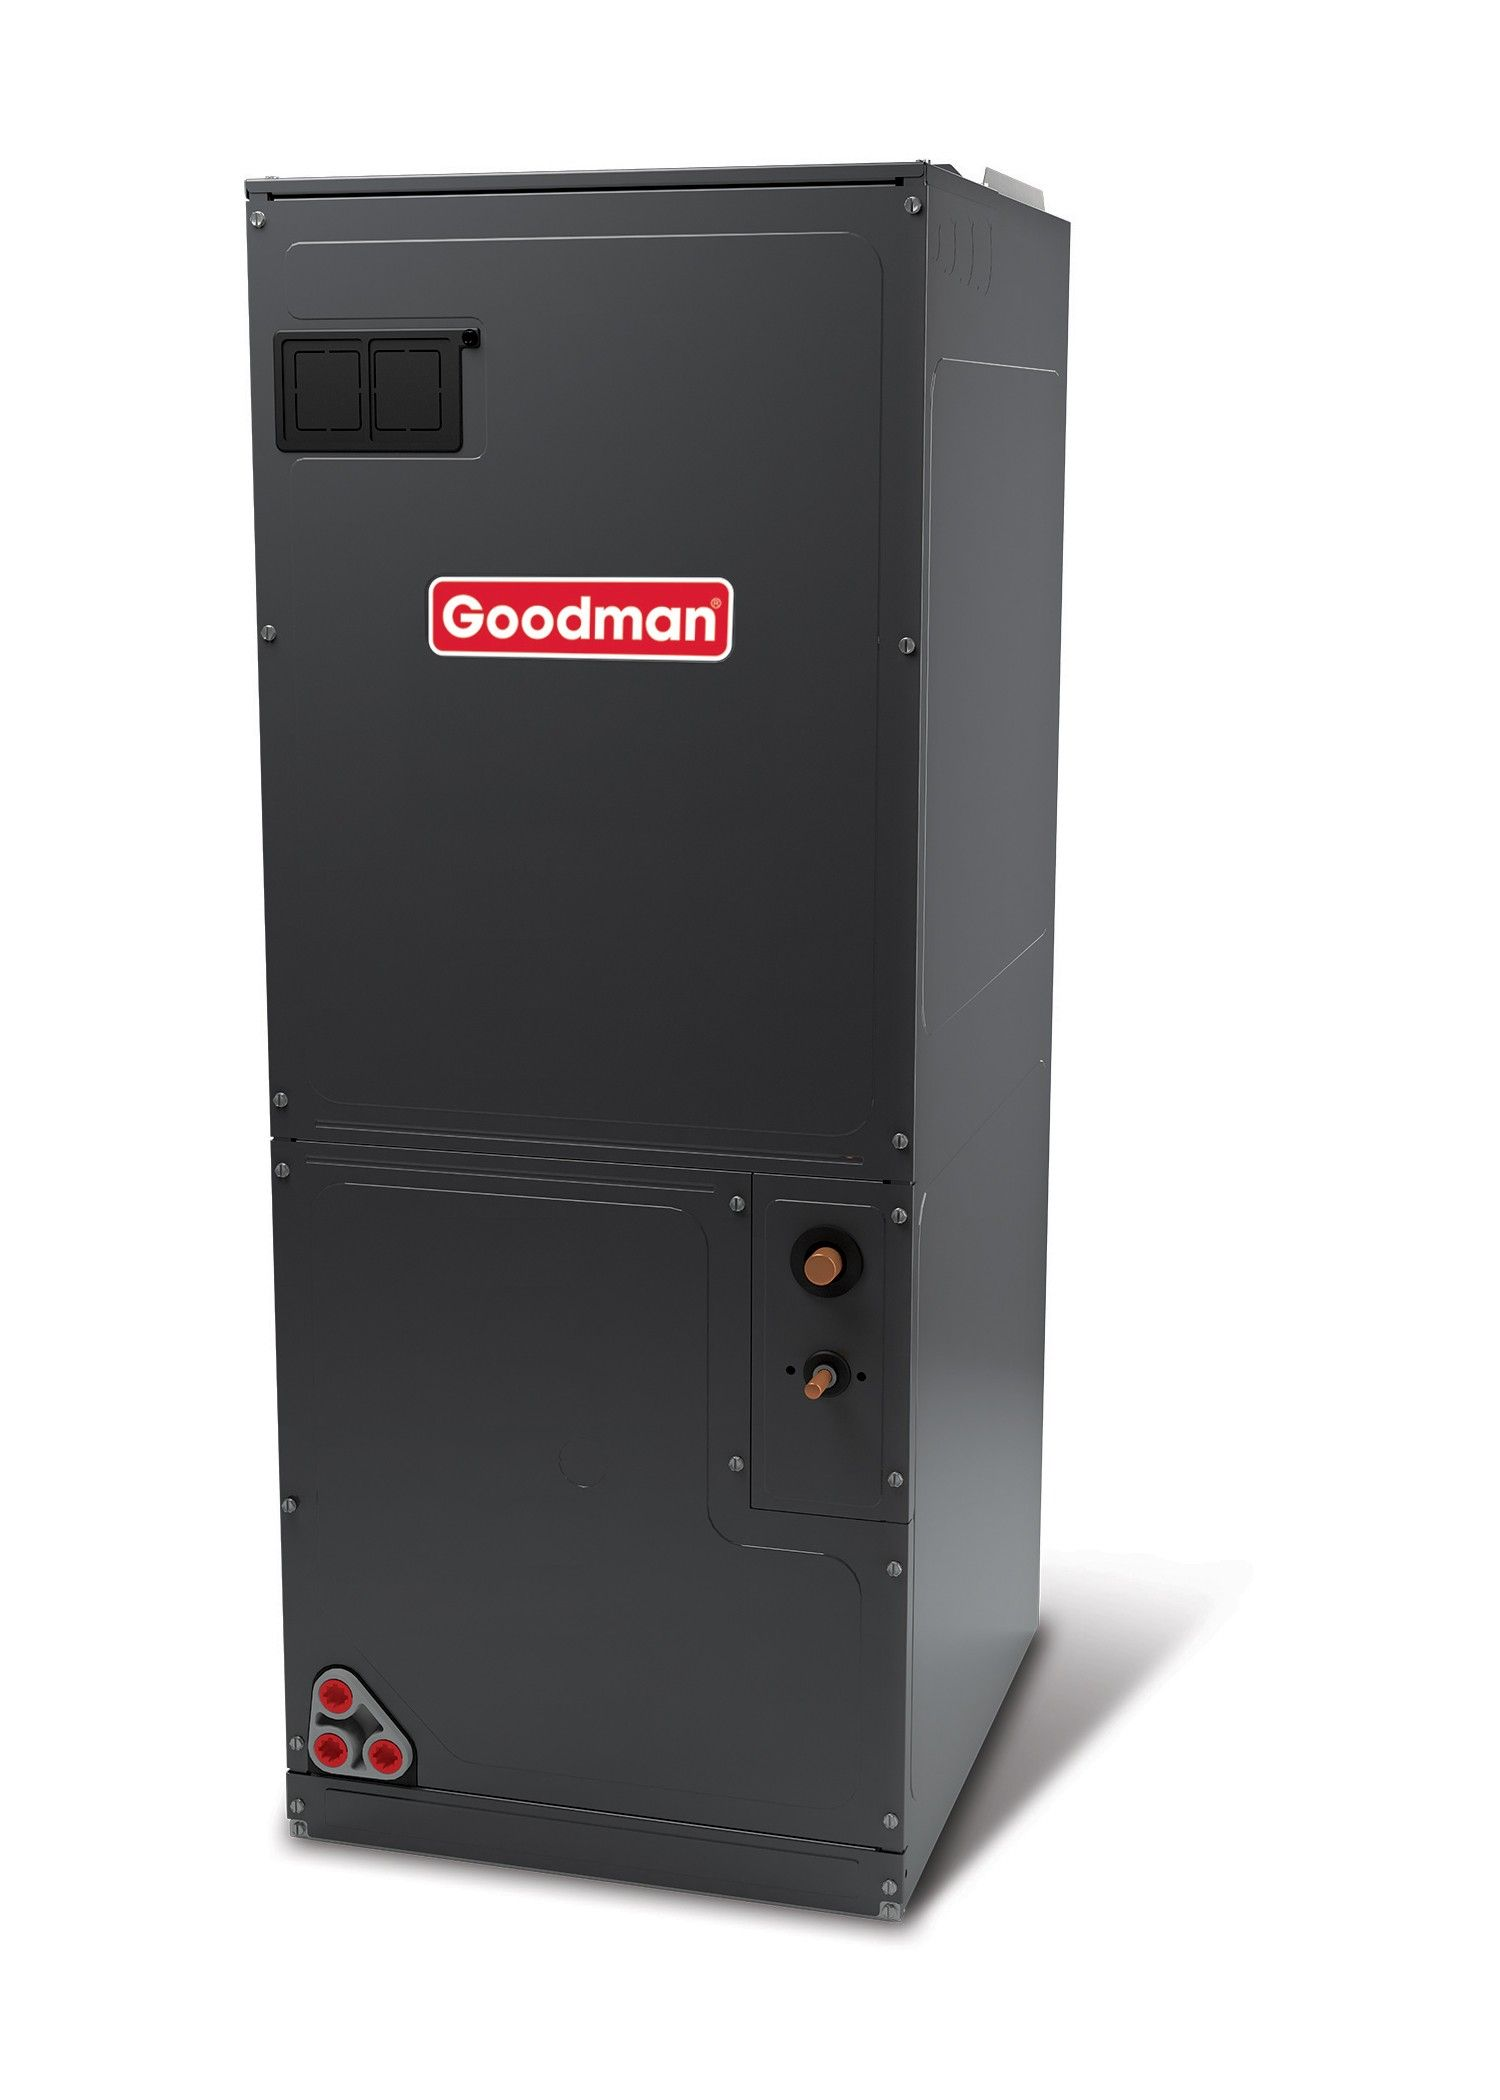 goodman awuf air handler wiring diagram 2002 honda civic radio 2 ton aspt high efficincy multiposition